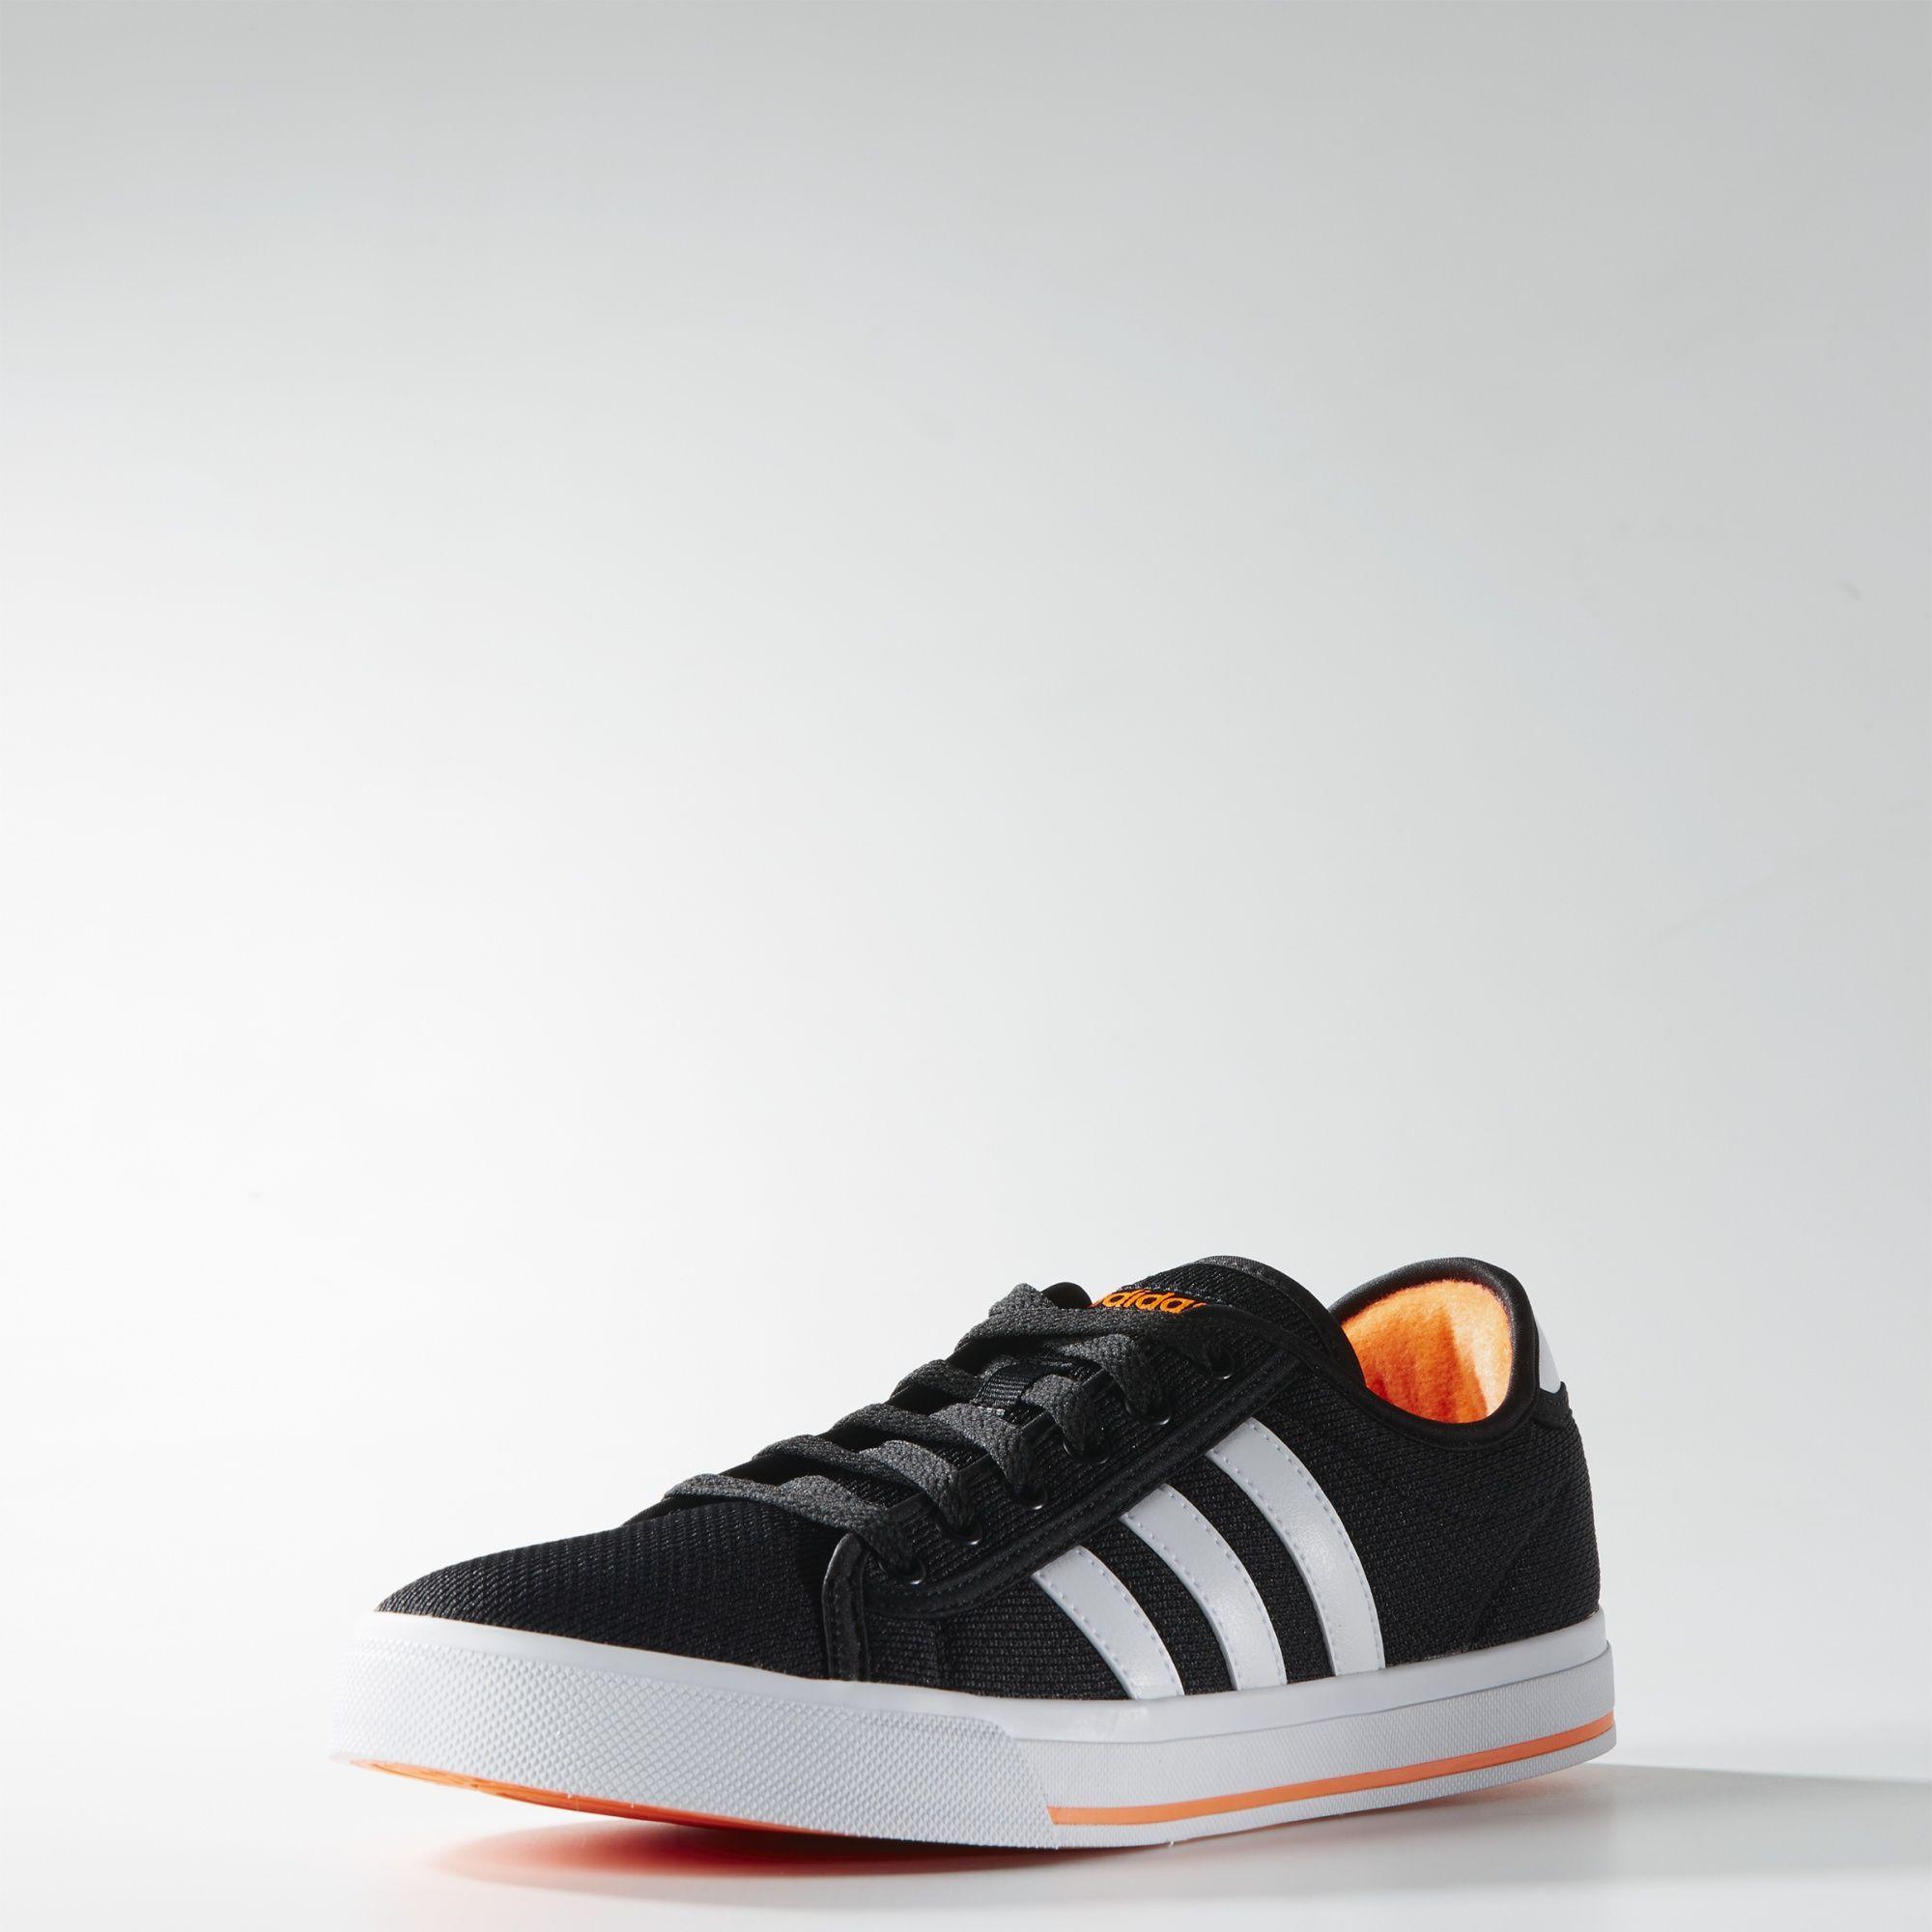 ADIDAS NEO TENIS NEO DAILY BIND http://www.adidas.mx/